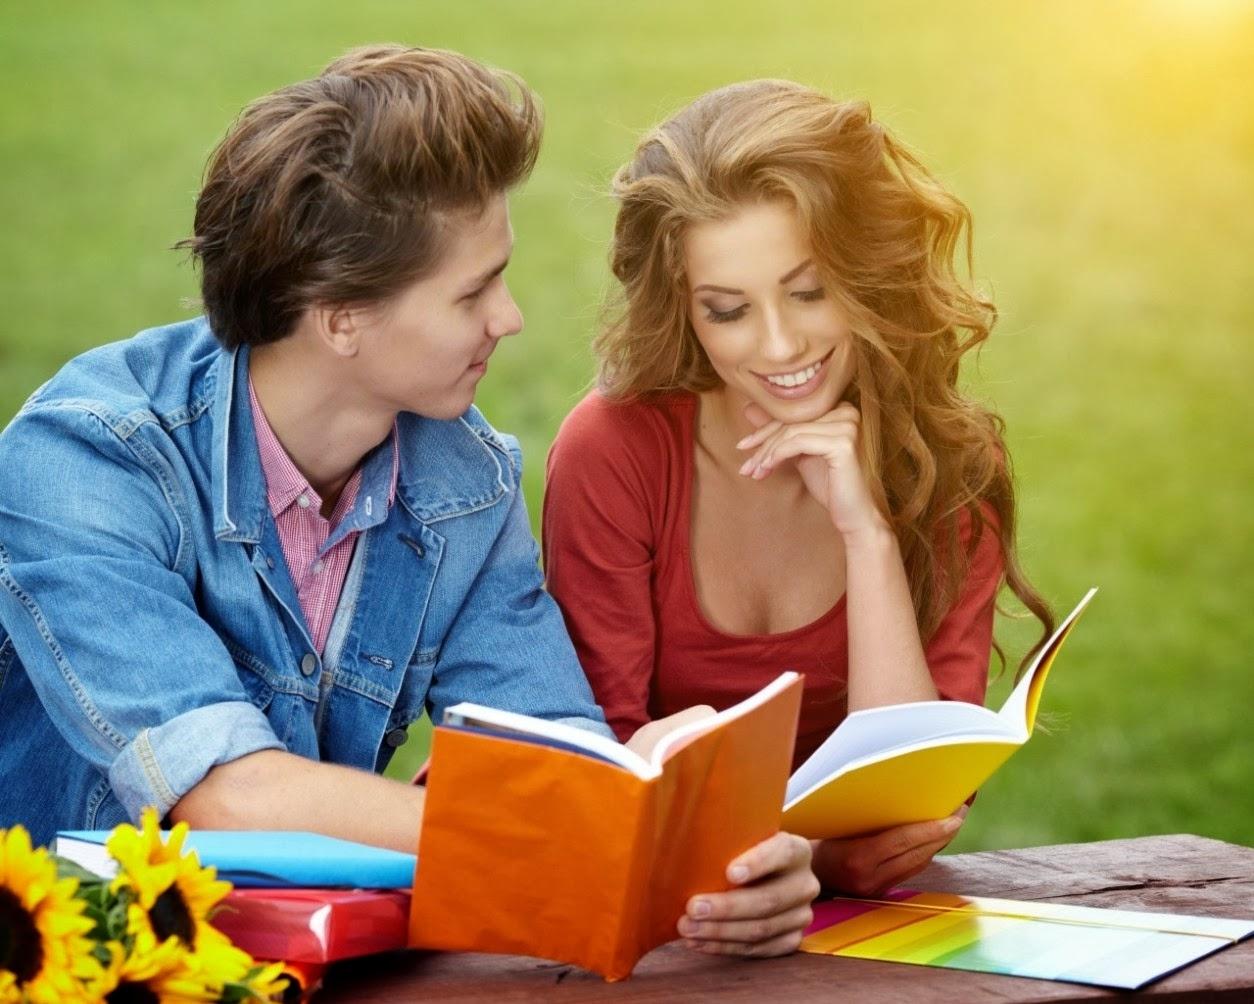 love romantic boys and girls wallpapers, interesting love romantic